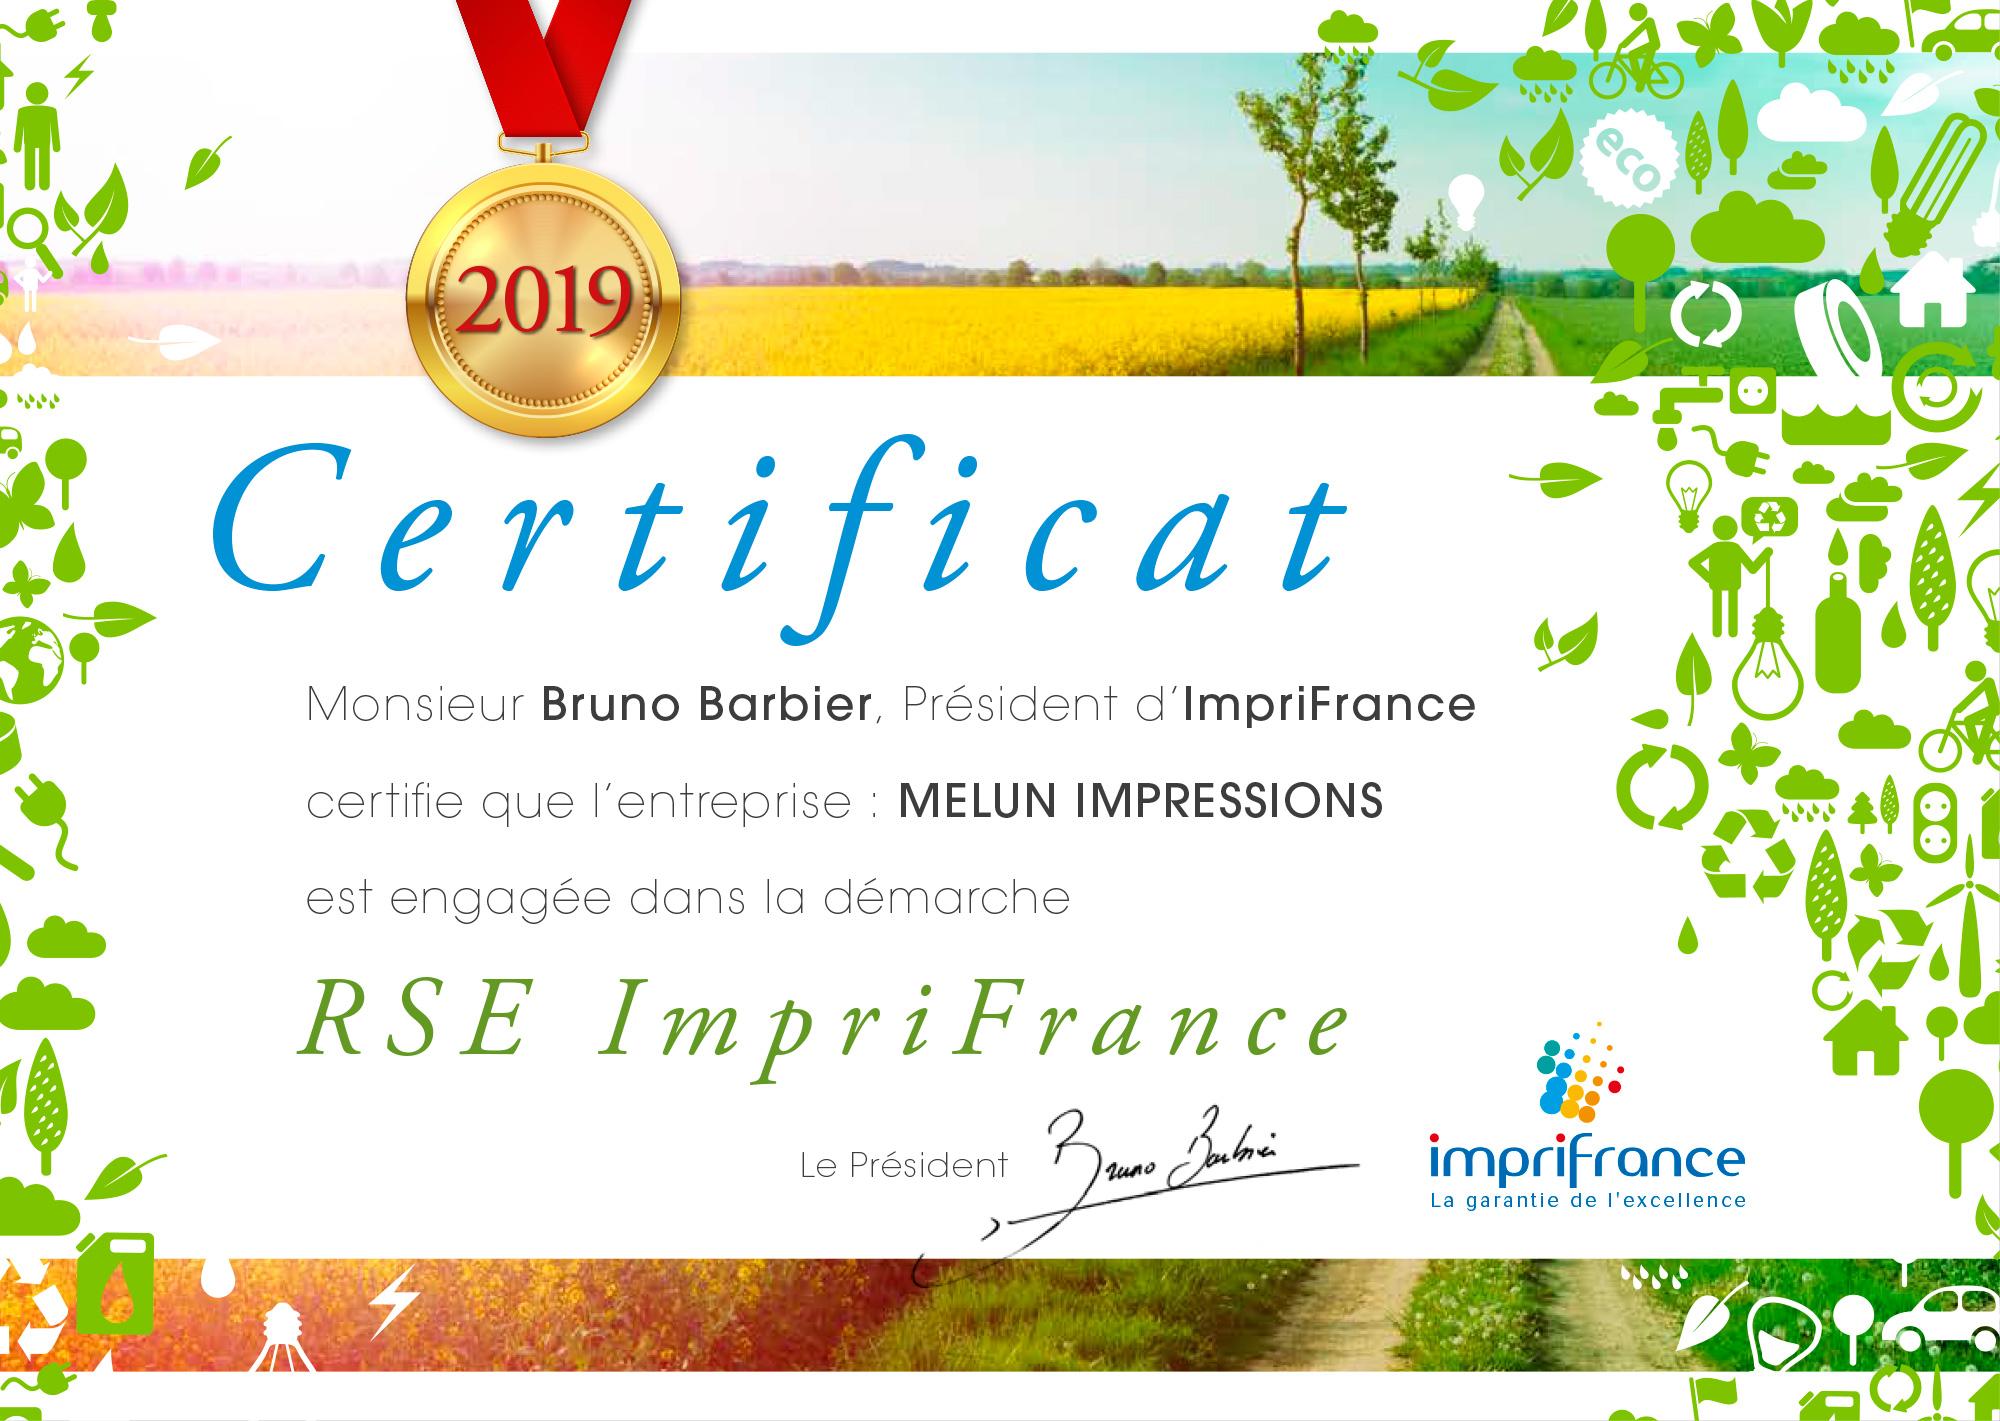 Certificat RSE 2019